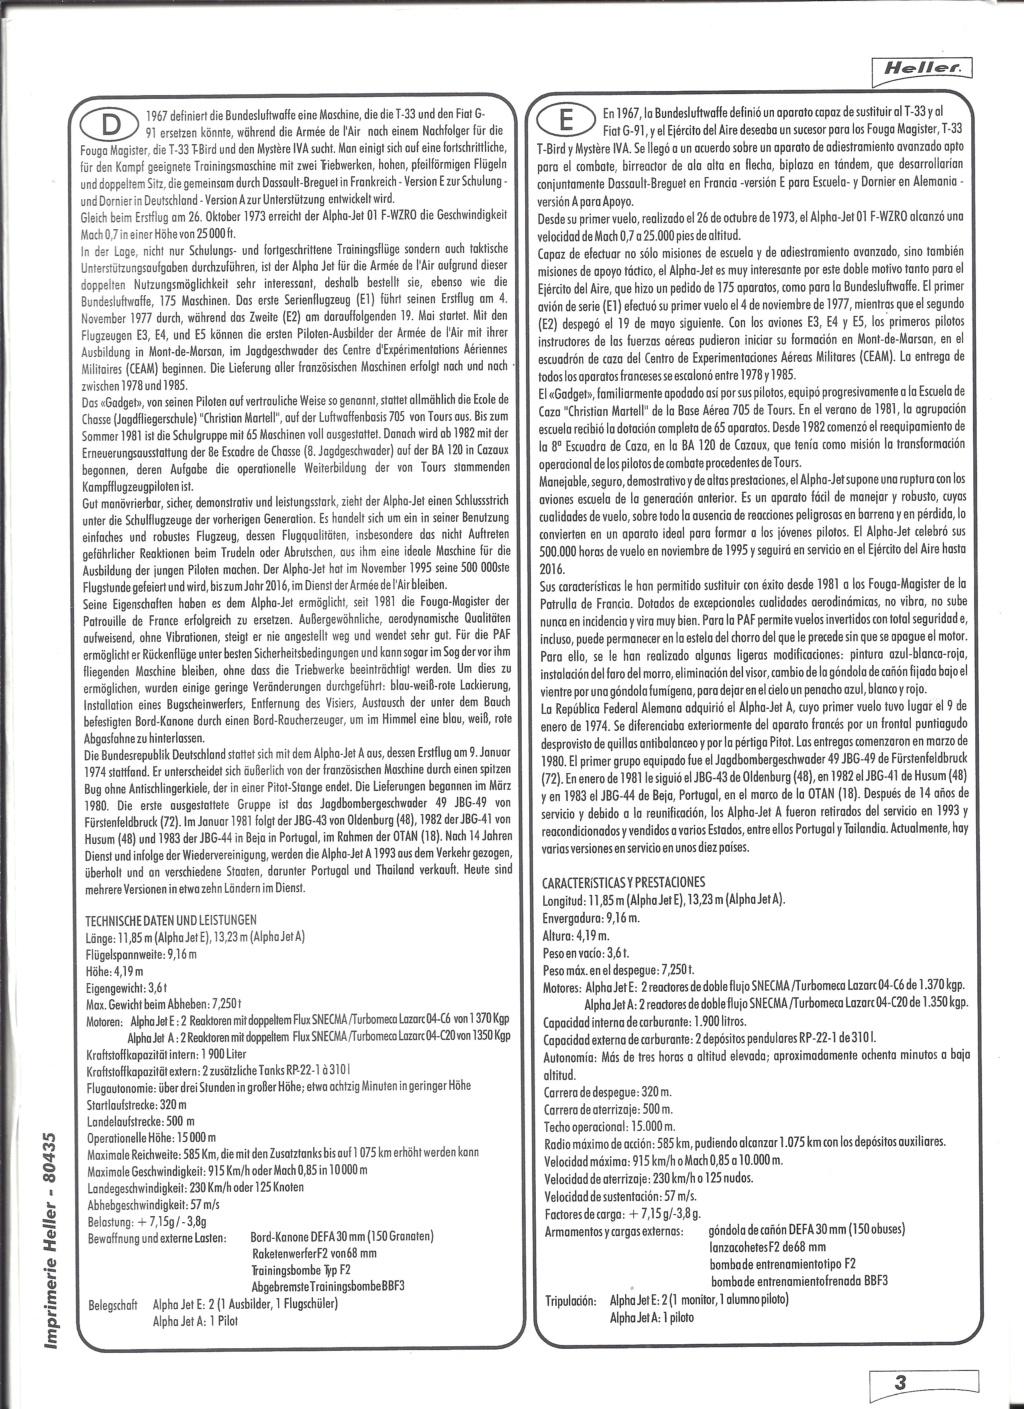 DASSAULT-BREGUET / DORNIER ALPHA JET 1/48ème Réf 80435 Notice Helle658